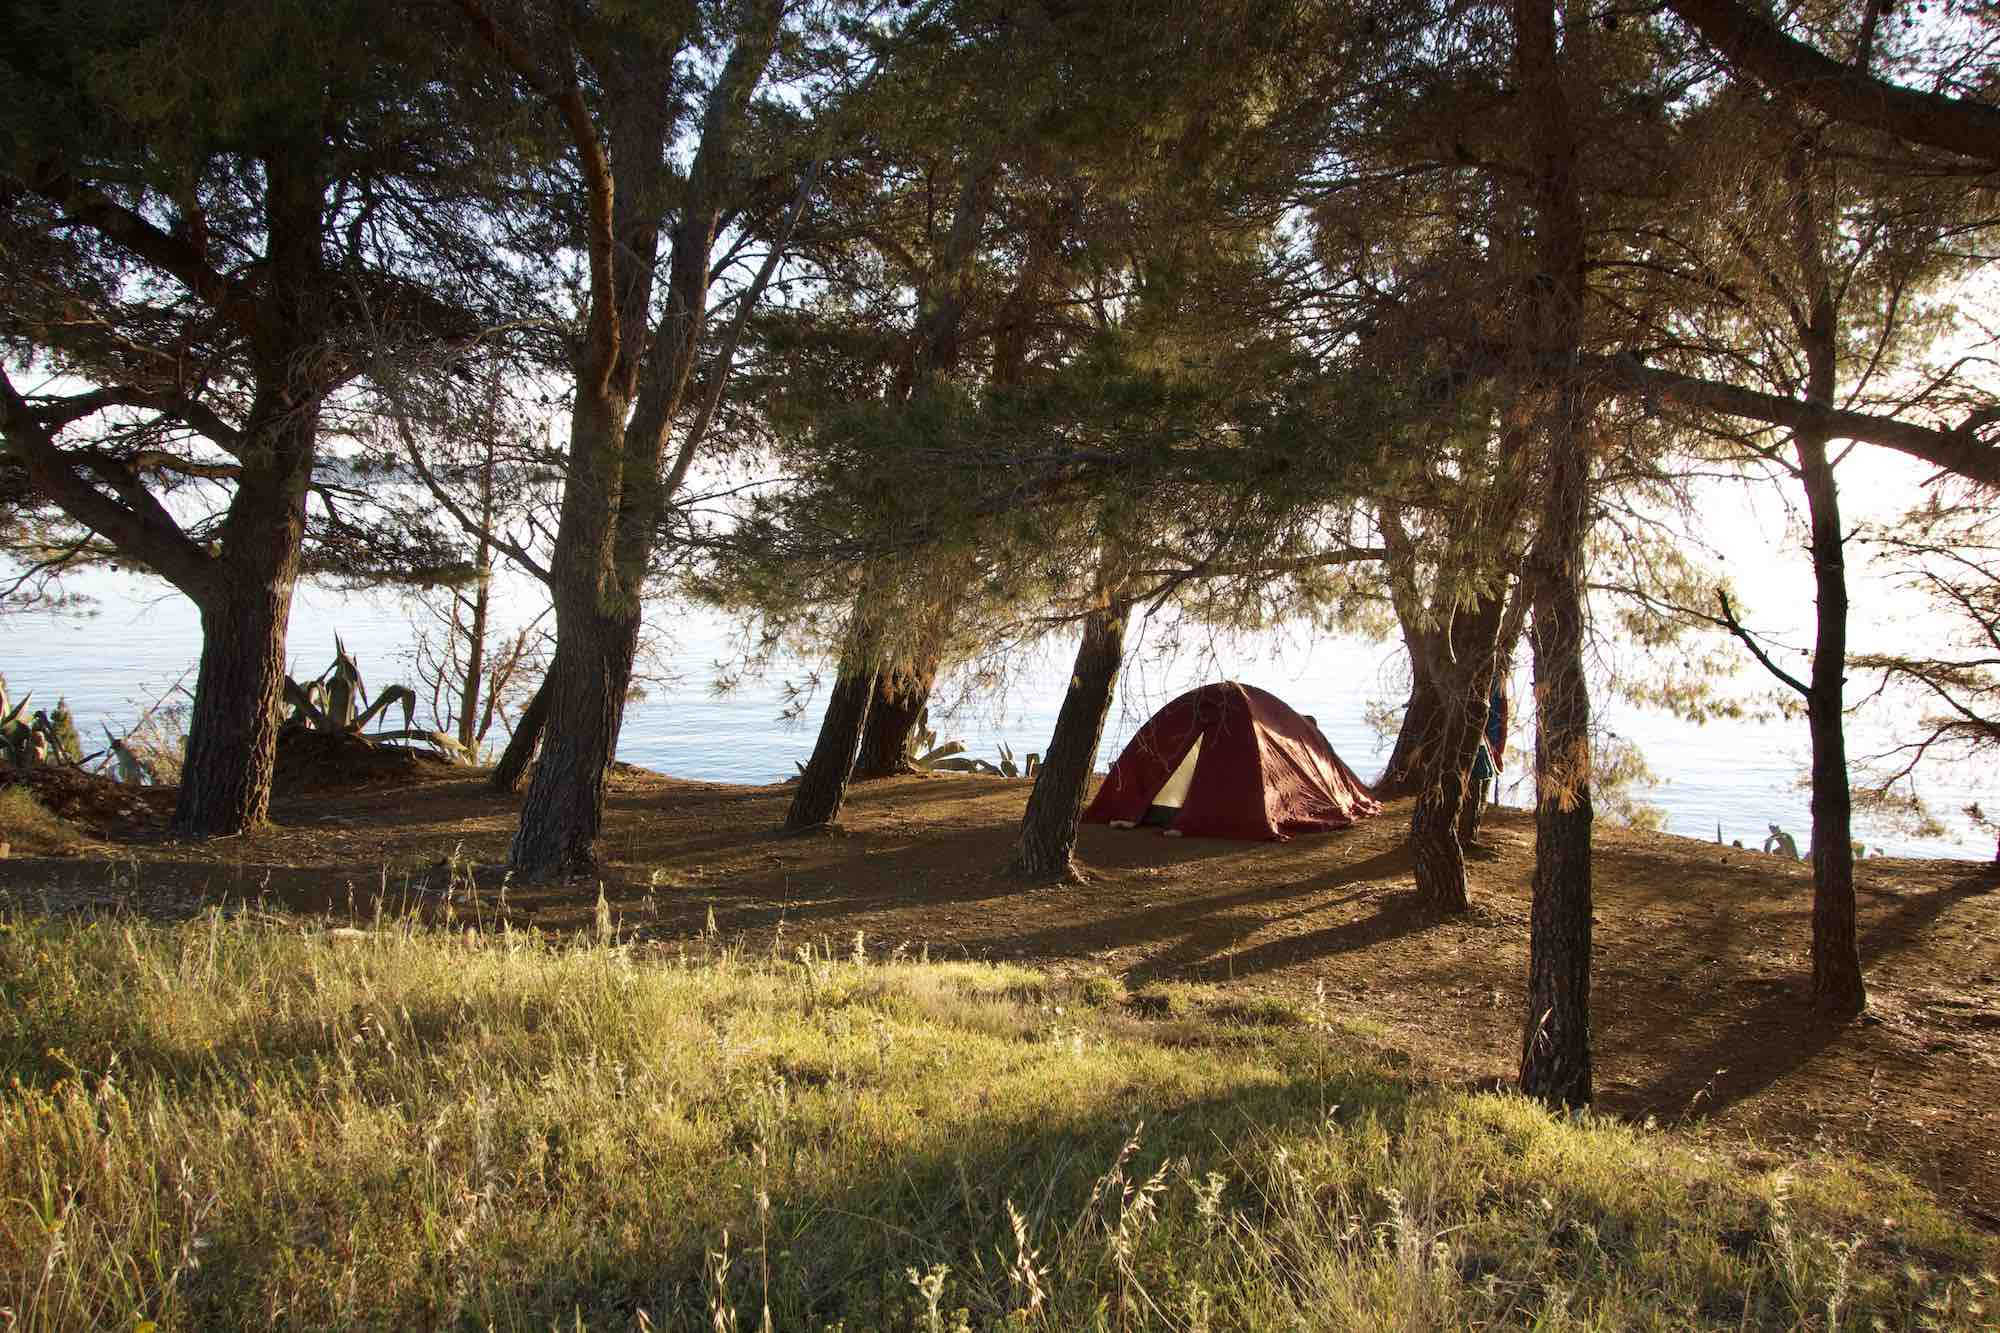 Camping on Vis Island, Croatia